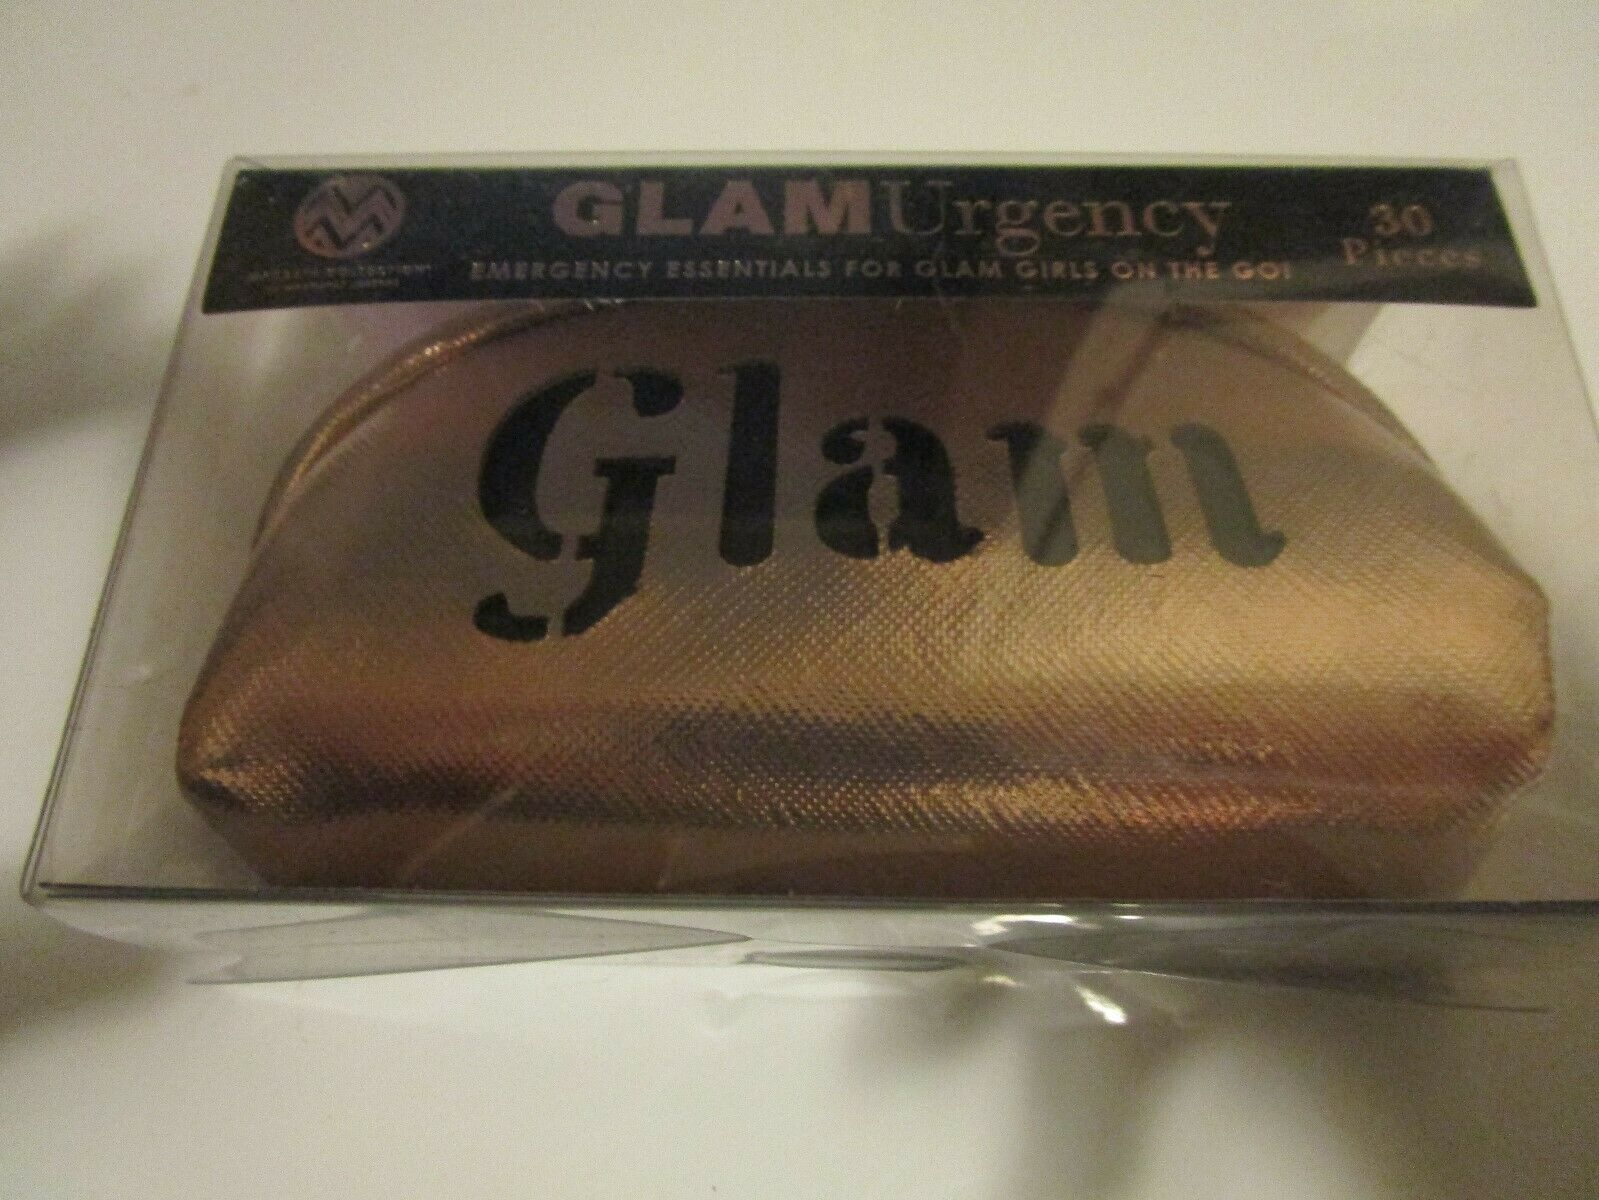 GLAMUrgency Emergency Essentials For Glam Girls On The Go Kit - $9.99